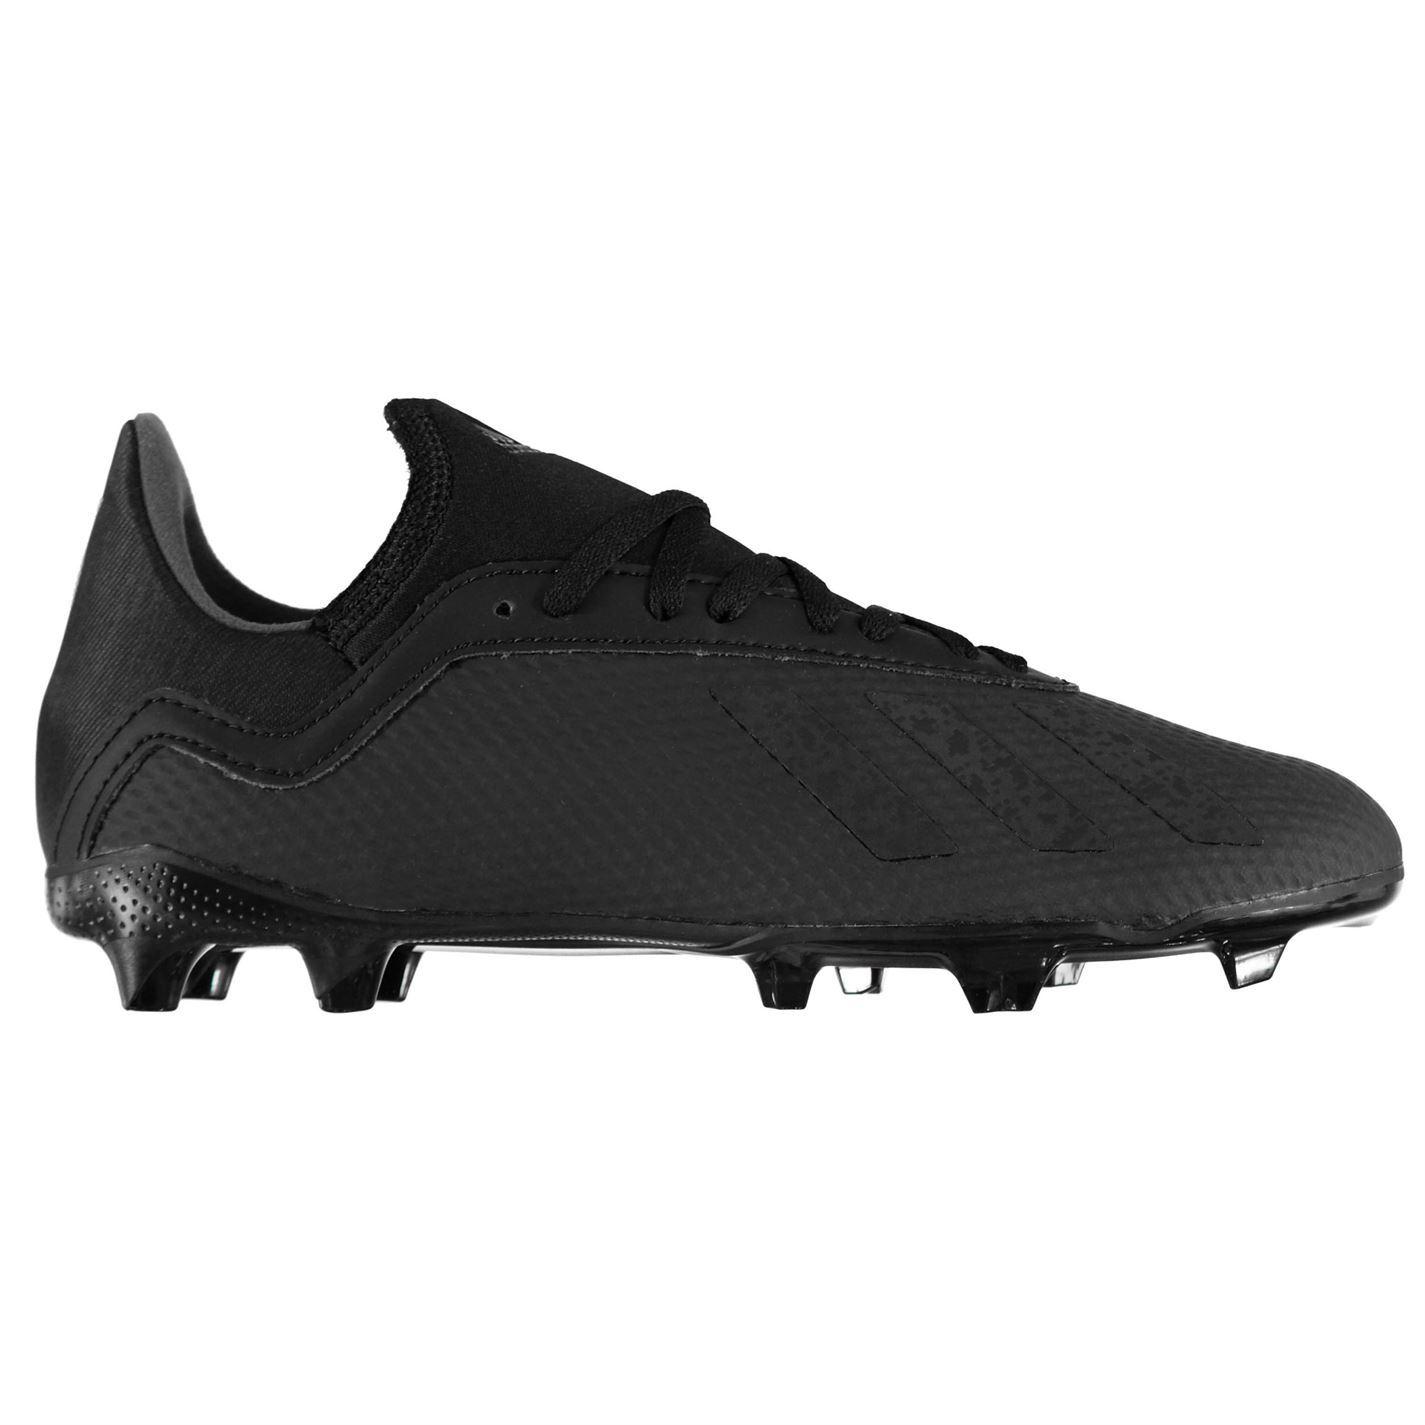 quite nice 720f0 3d66d ... 1 X 8,3 FG Firm Ground calcio stivali Juniors nero scarpe tacchetti da  calcio ...